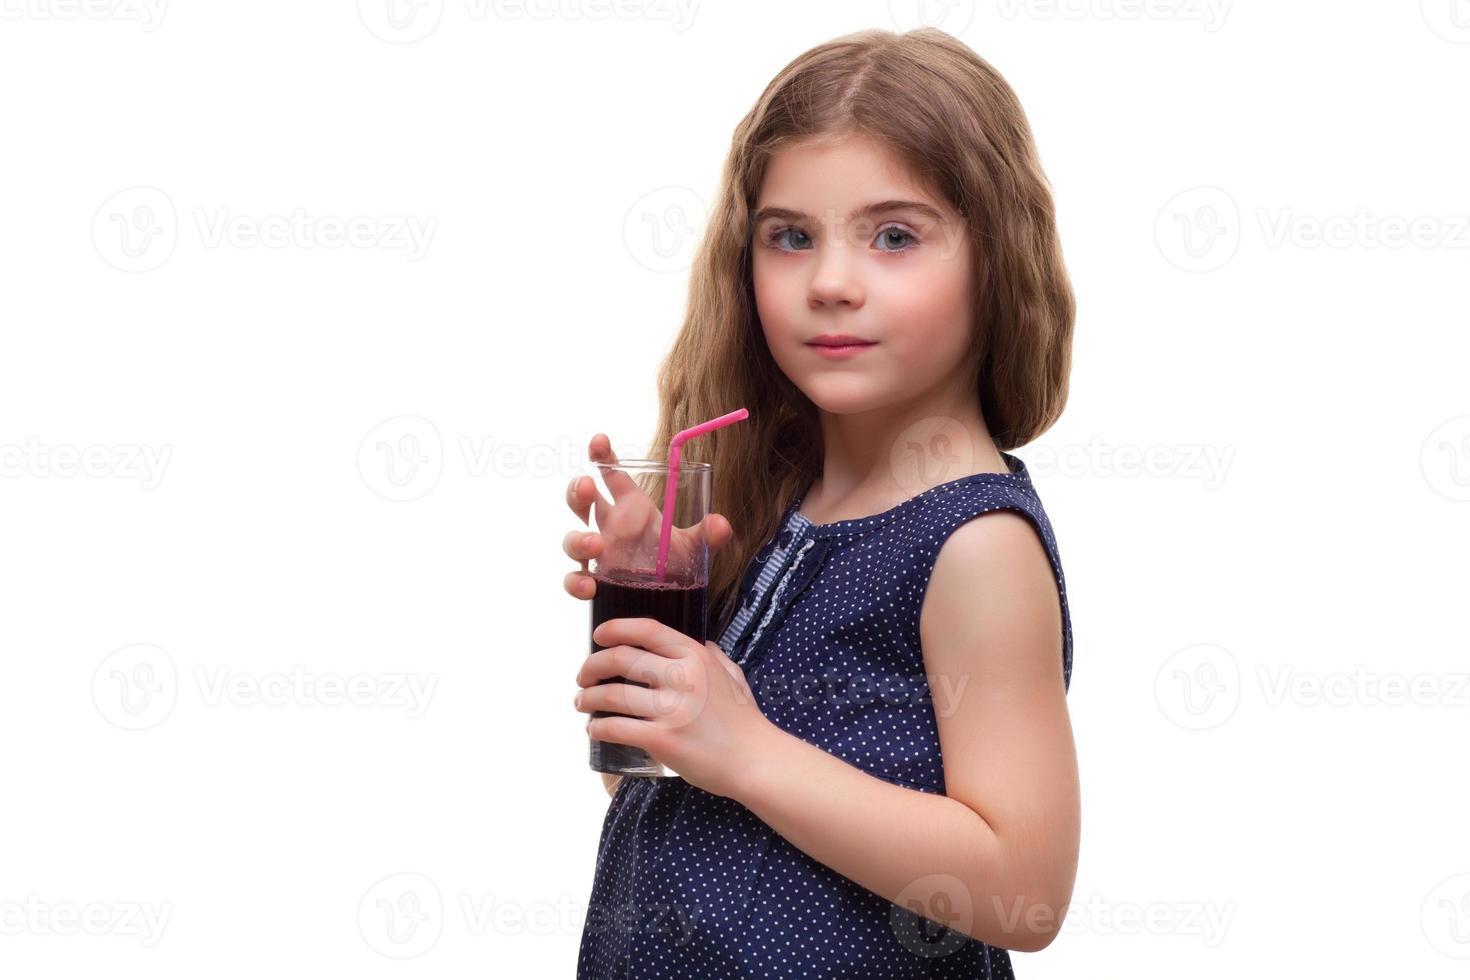 riprese in studio, bevande da ragazza foto